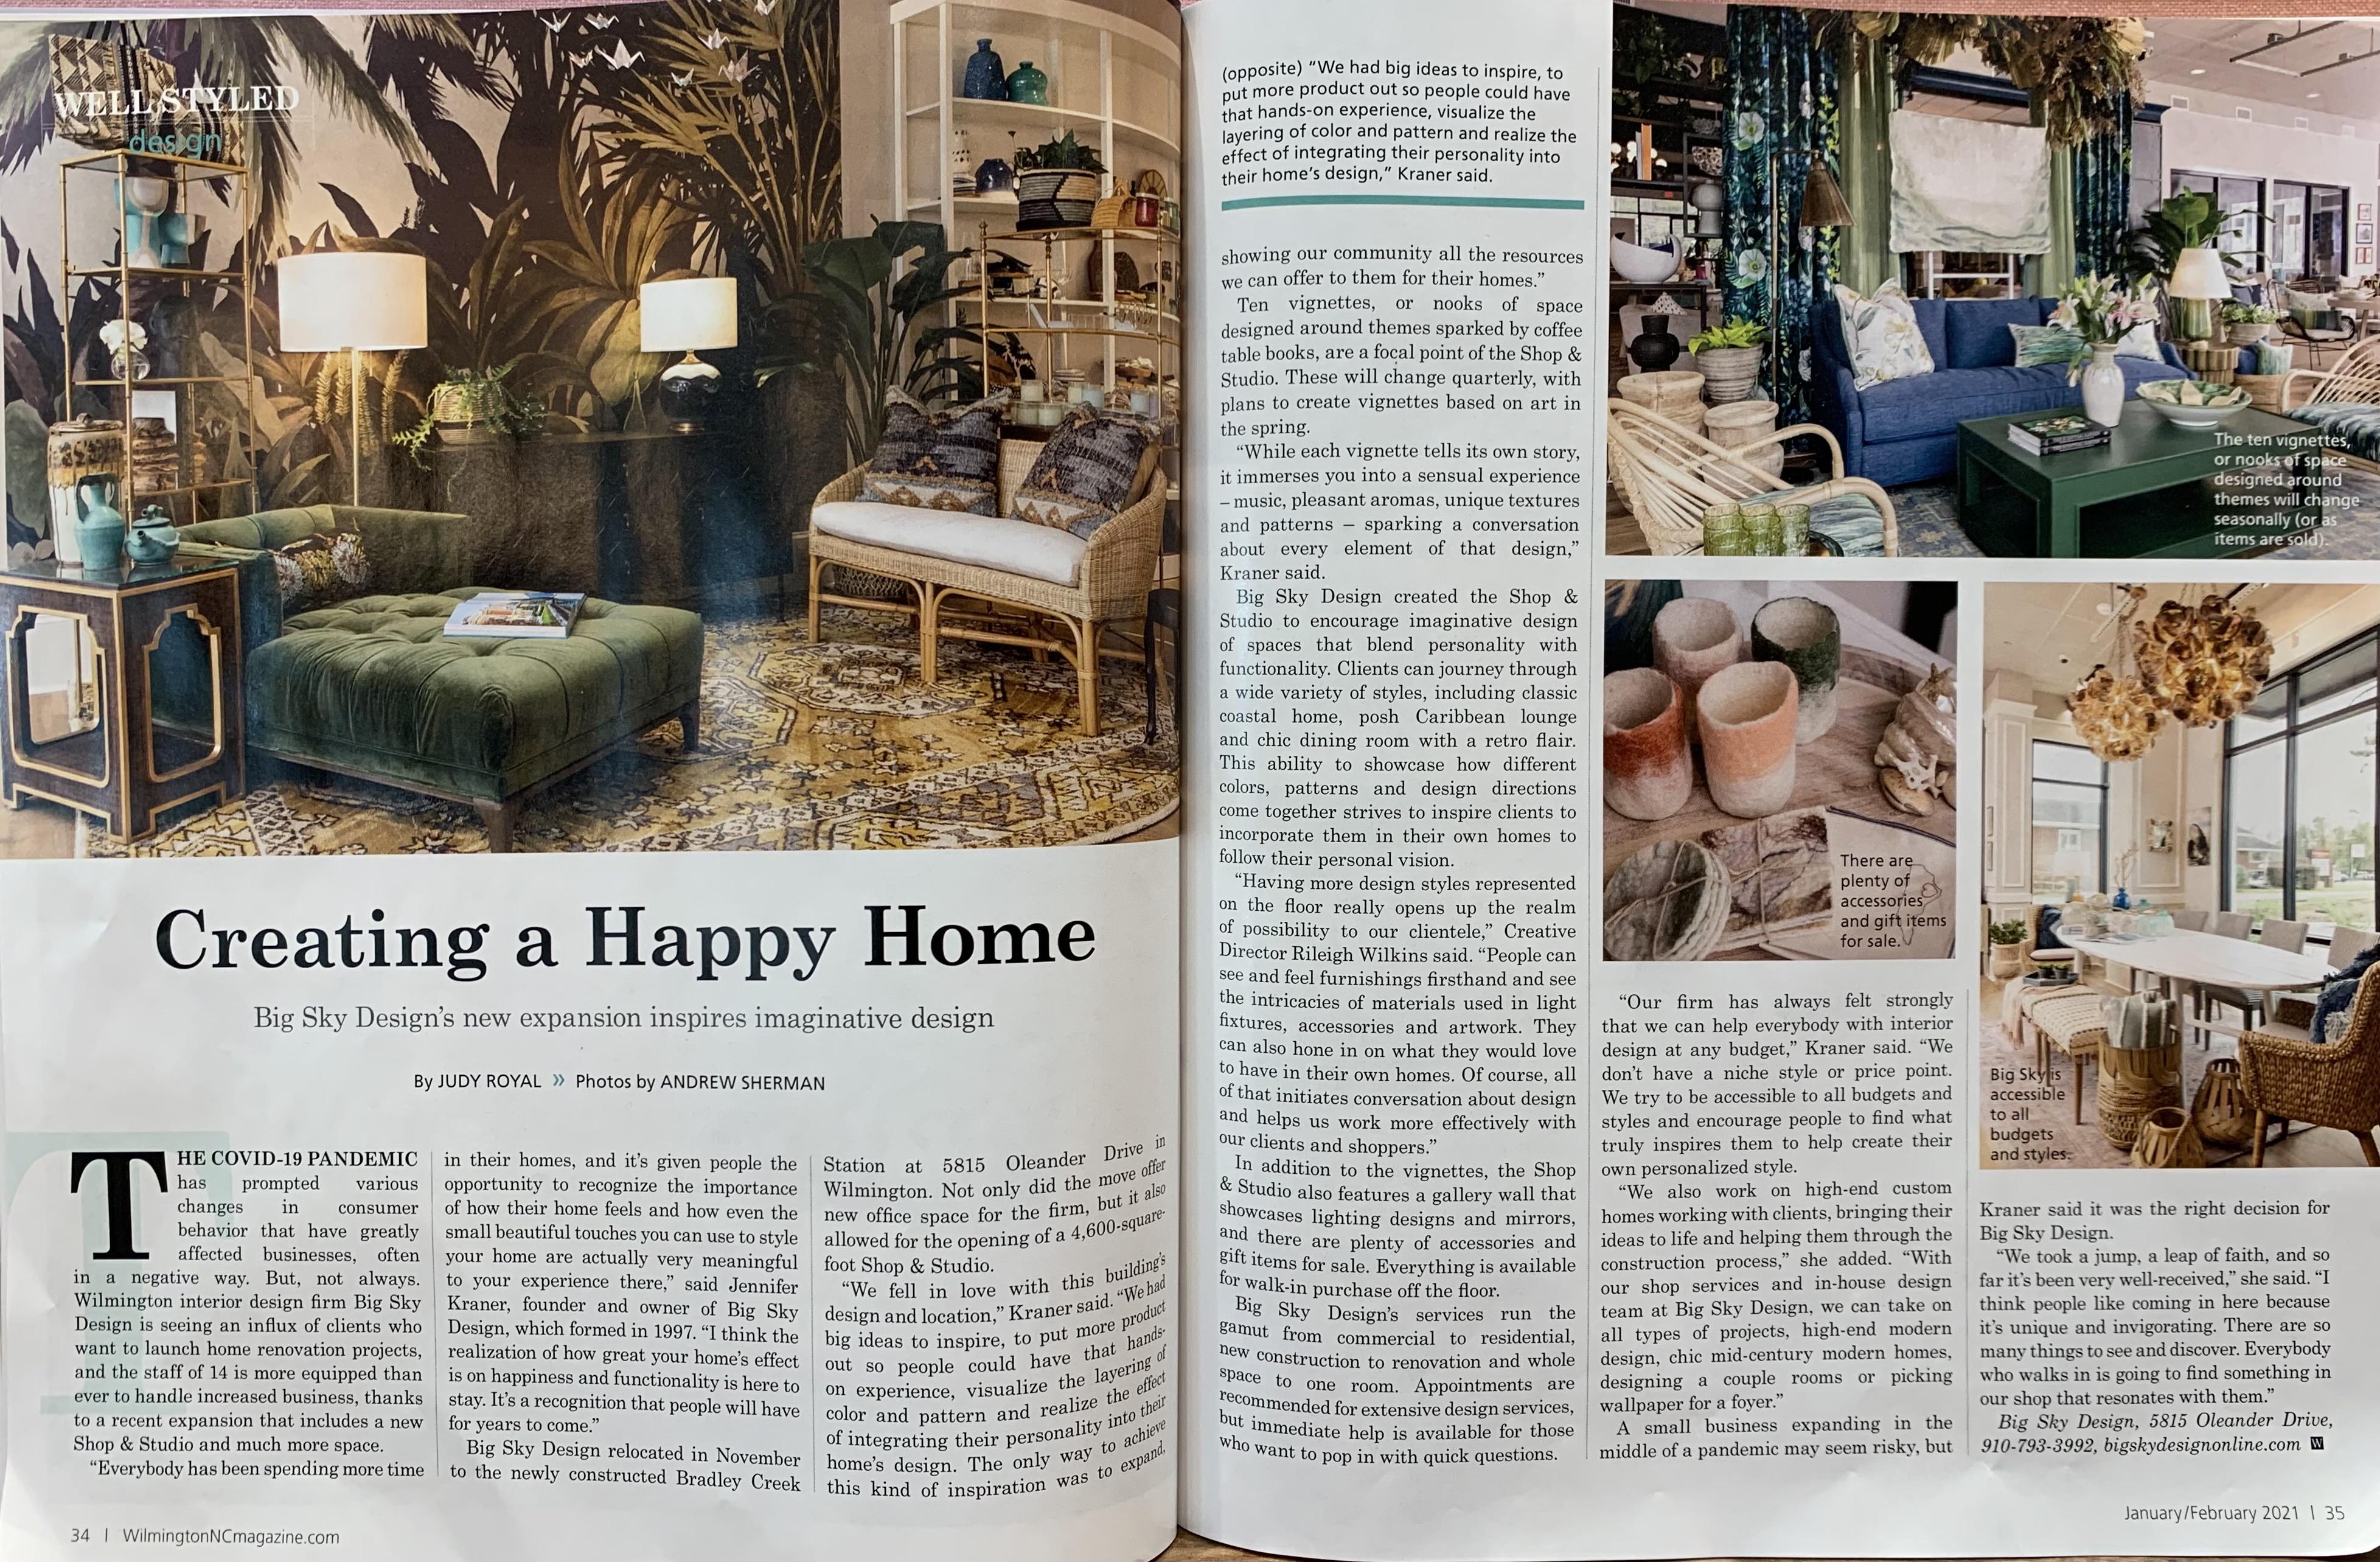 Wilmington Magazine, January/February 2021